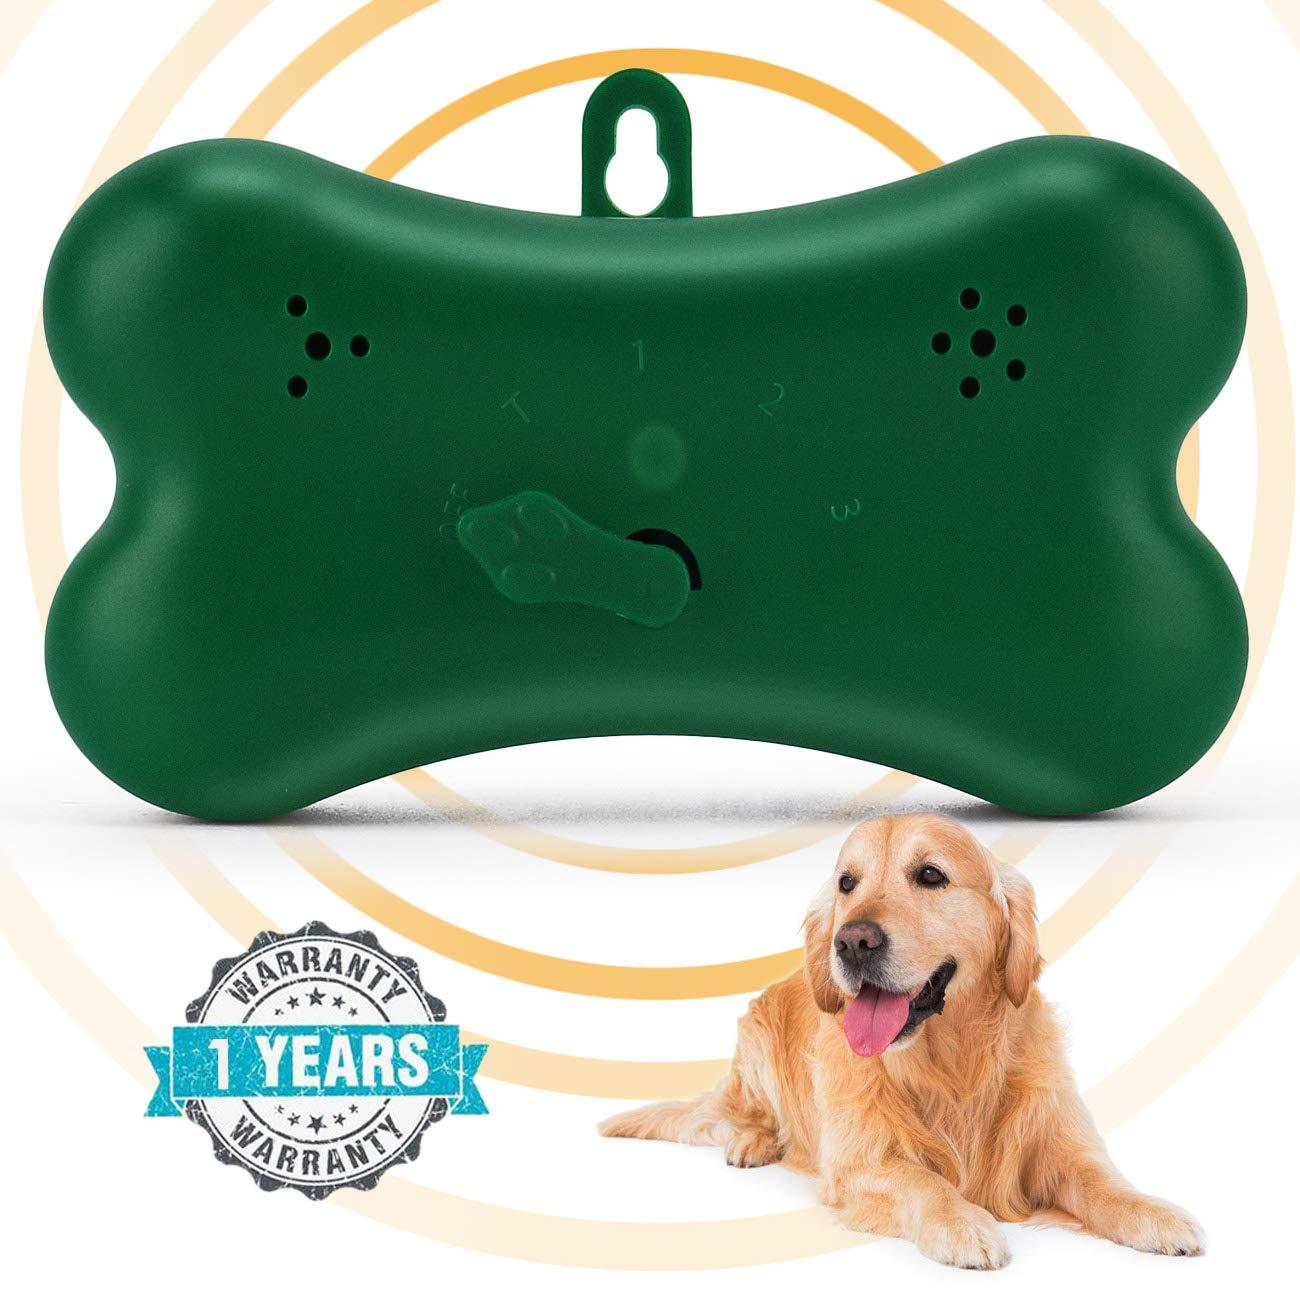 ShamBo Anti Barking Device, Mini Bark Control Device Outdoor Anti Barking Ultrasonic Dog Bark Control Sonic Bark Deterrents Silencer Stop Barking Bark Stop Repeller, Dog bark control (2018 New Green)